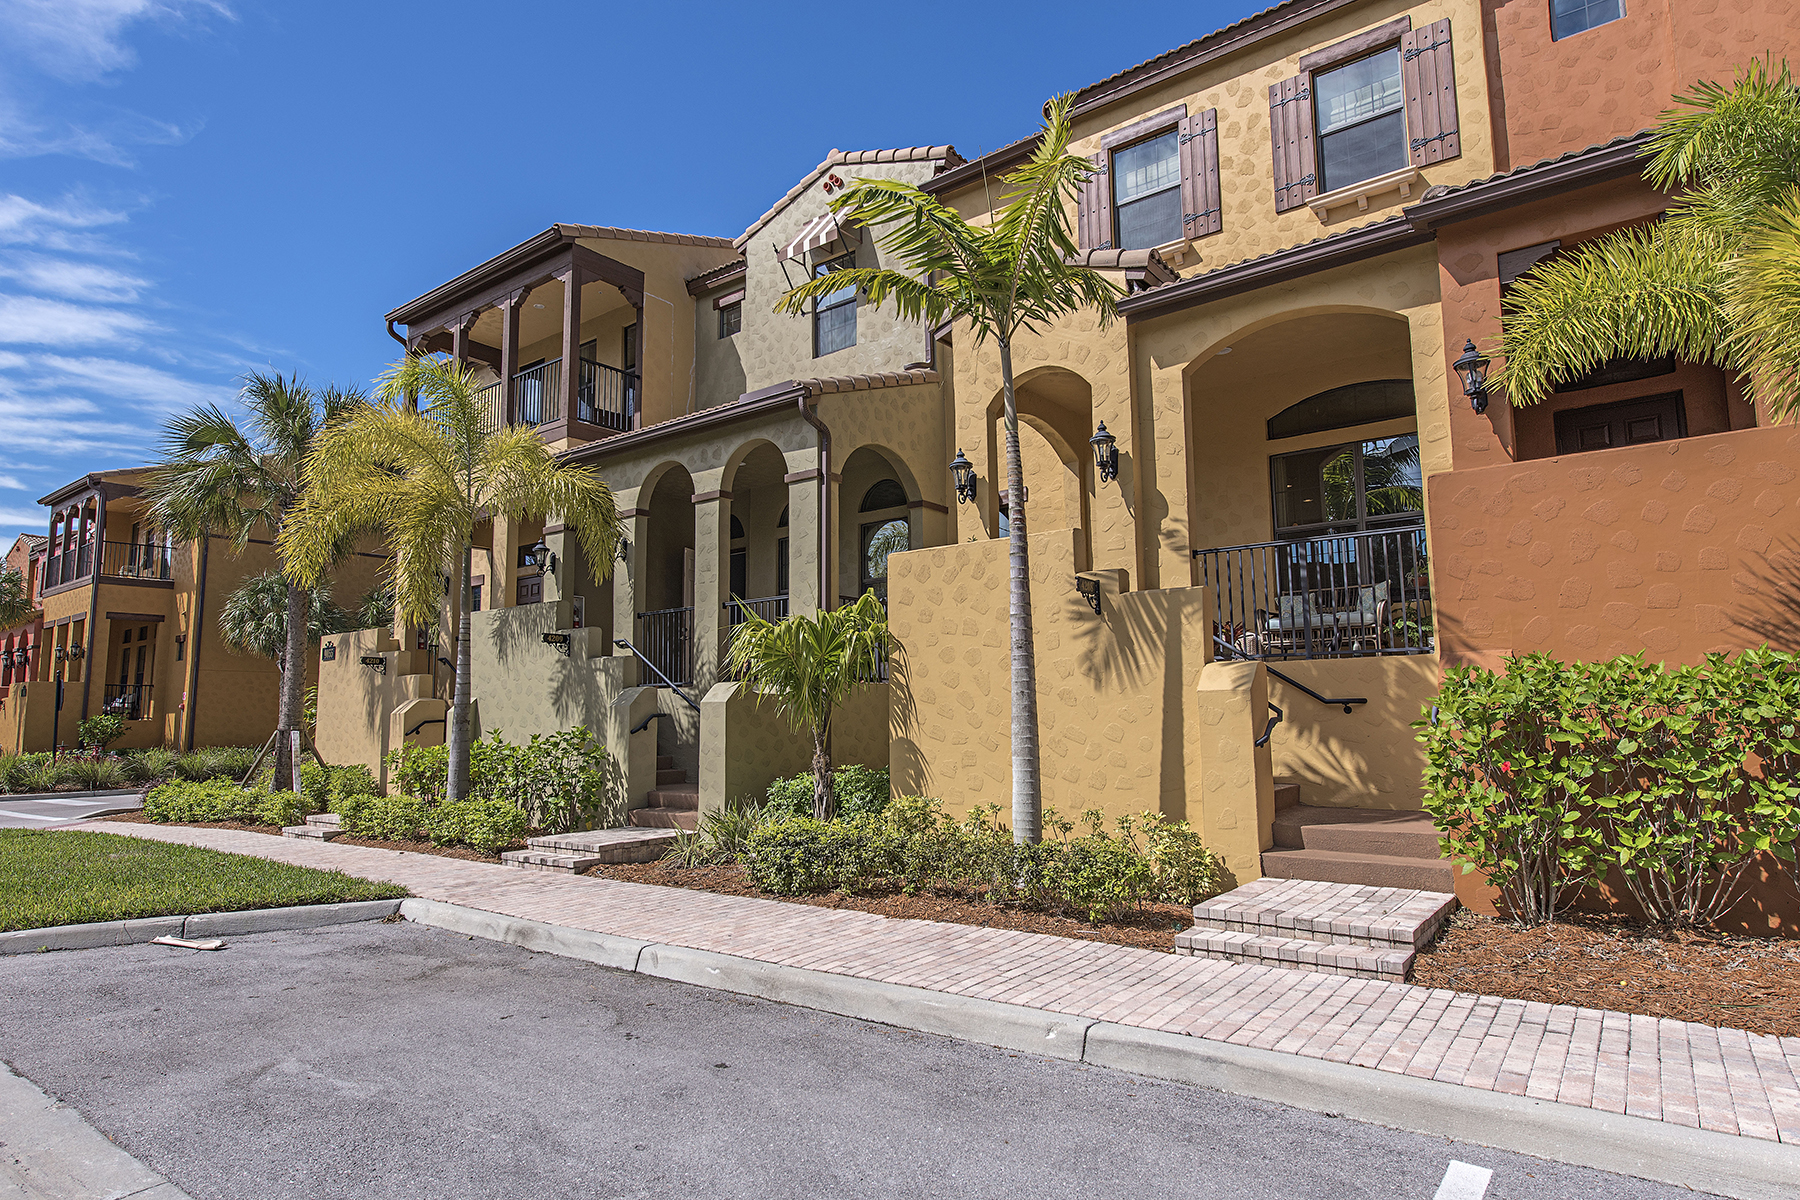 Condominium for Sale at LELY RESORT - OLE 9055 Capistrano St N 4208 Naples, Florida, 34113 United States